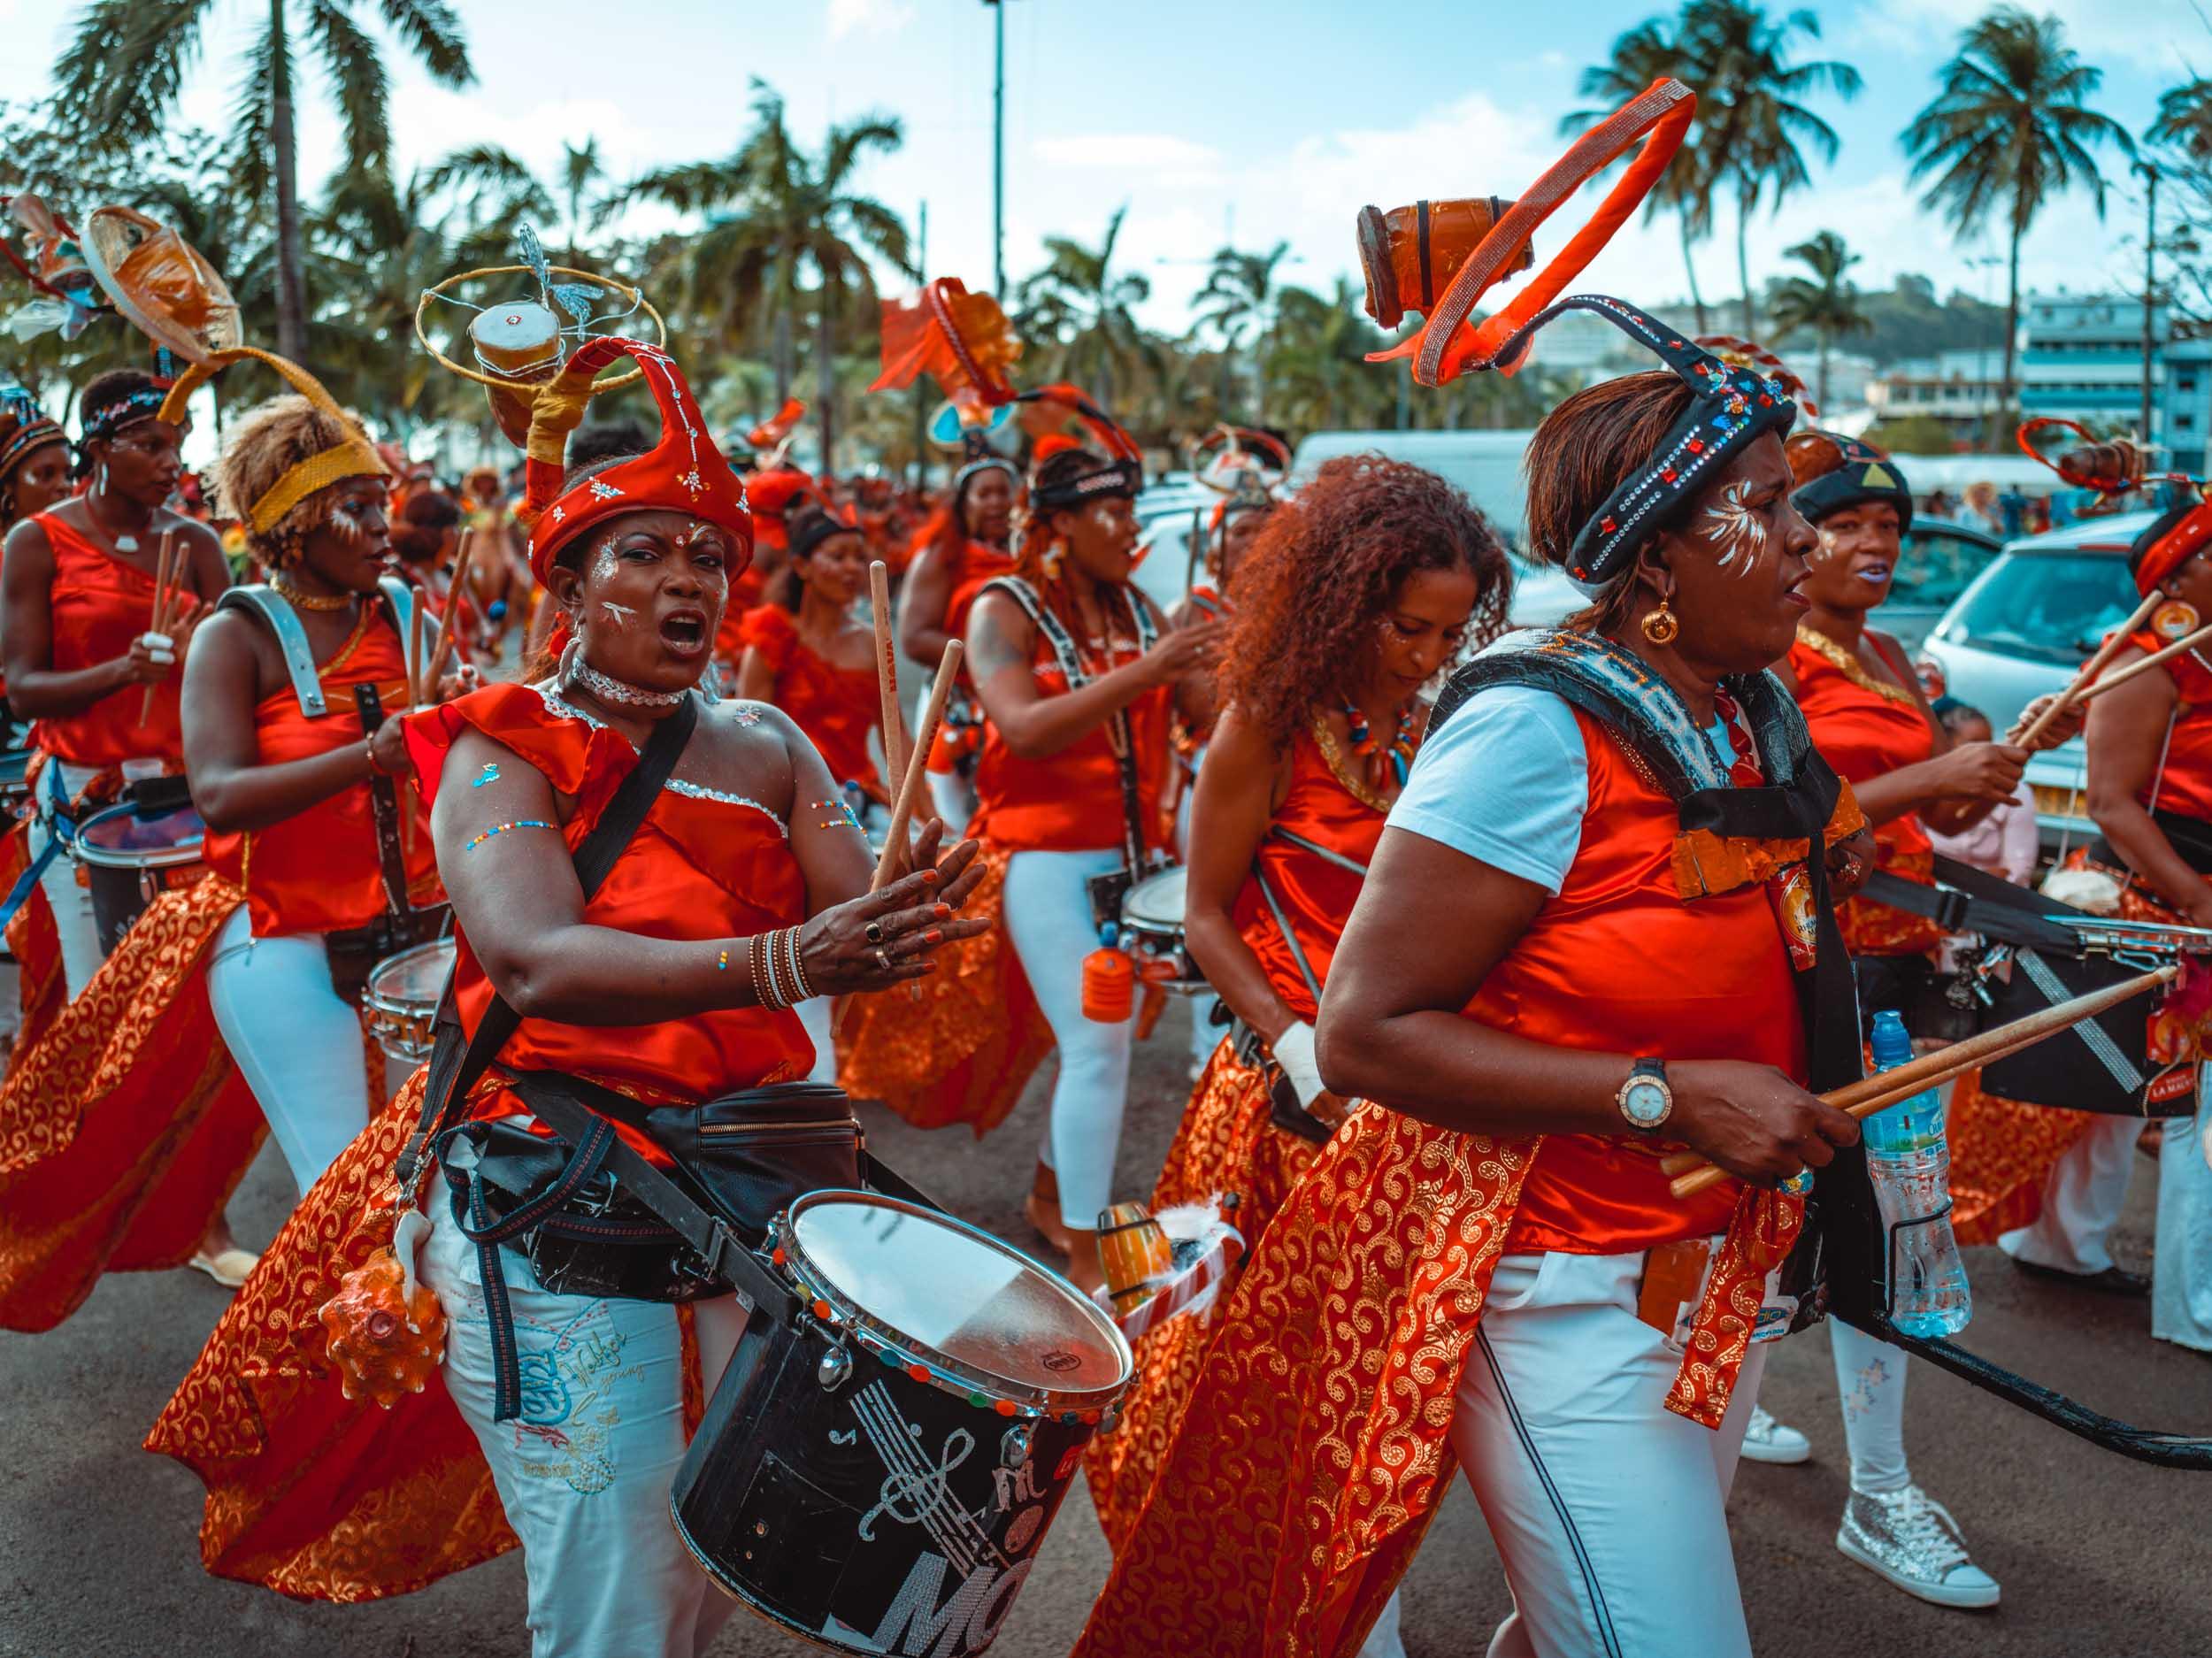 180213_SK_Martinique-58.jpg